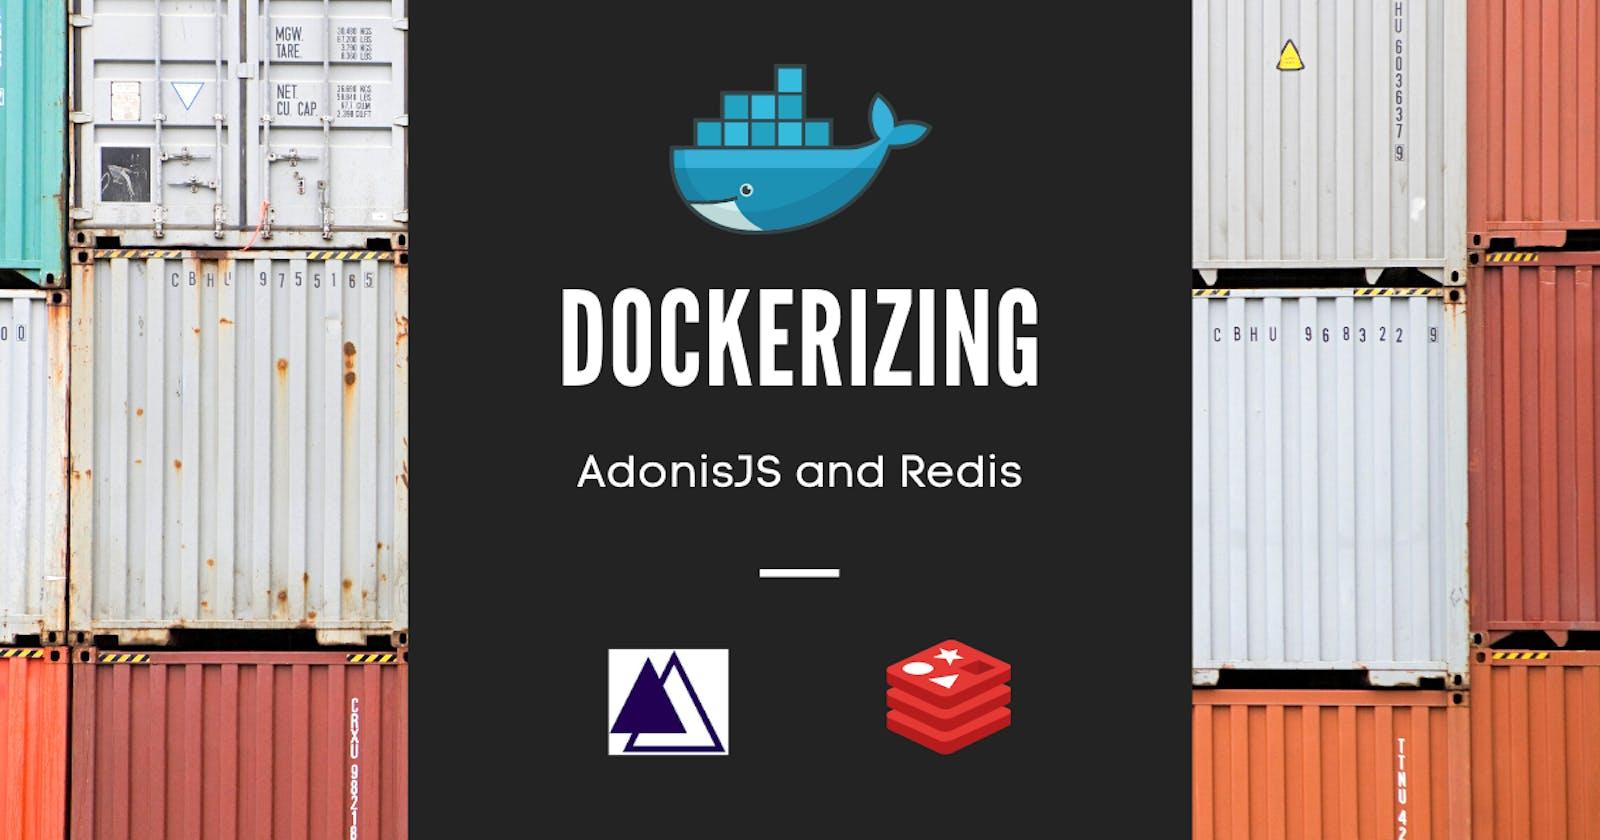 Dockerizing AdonisJS and Redis